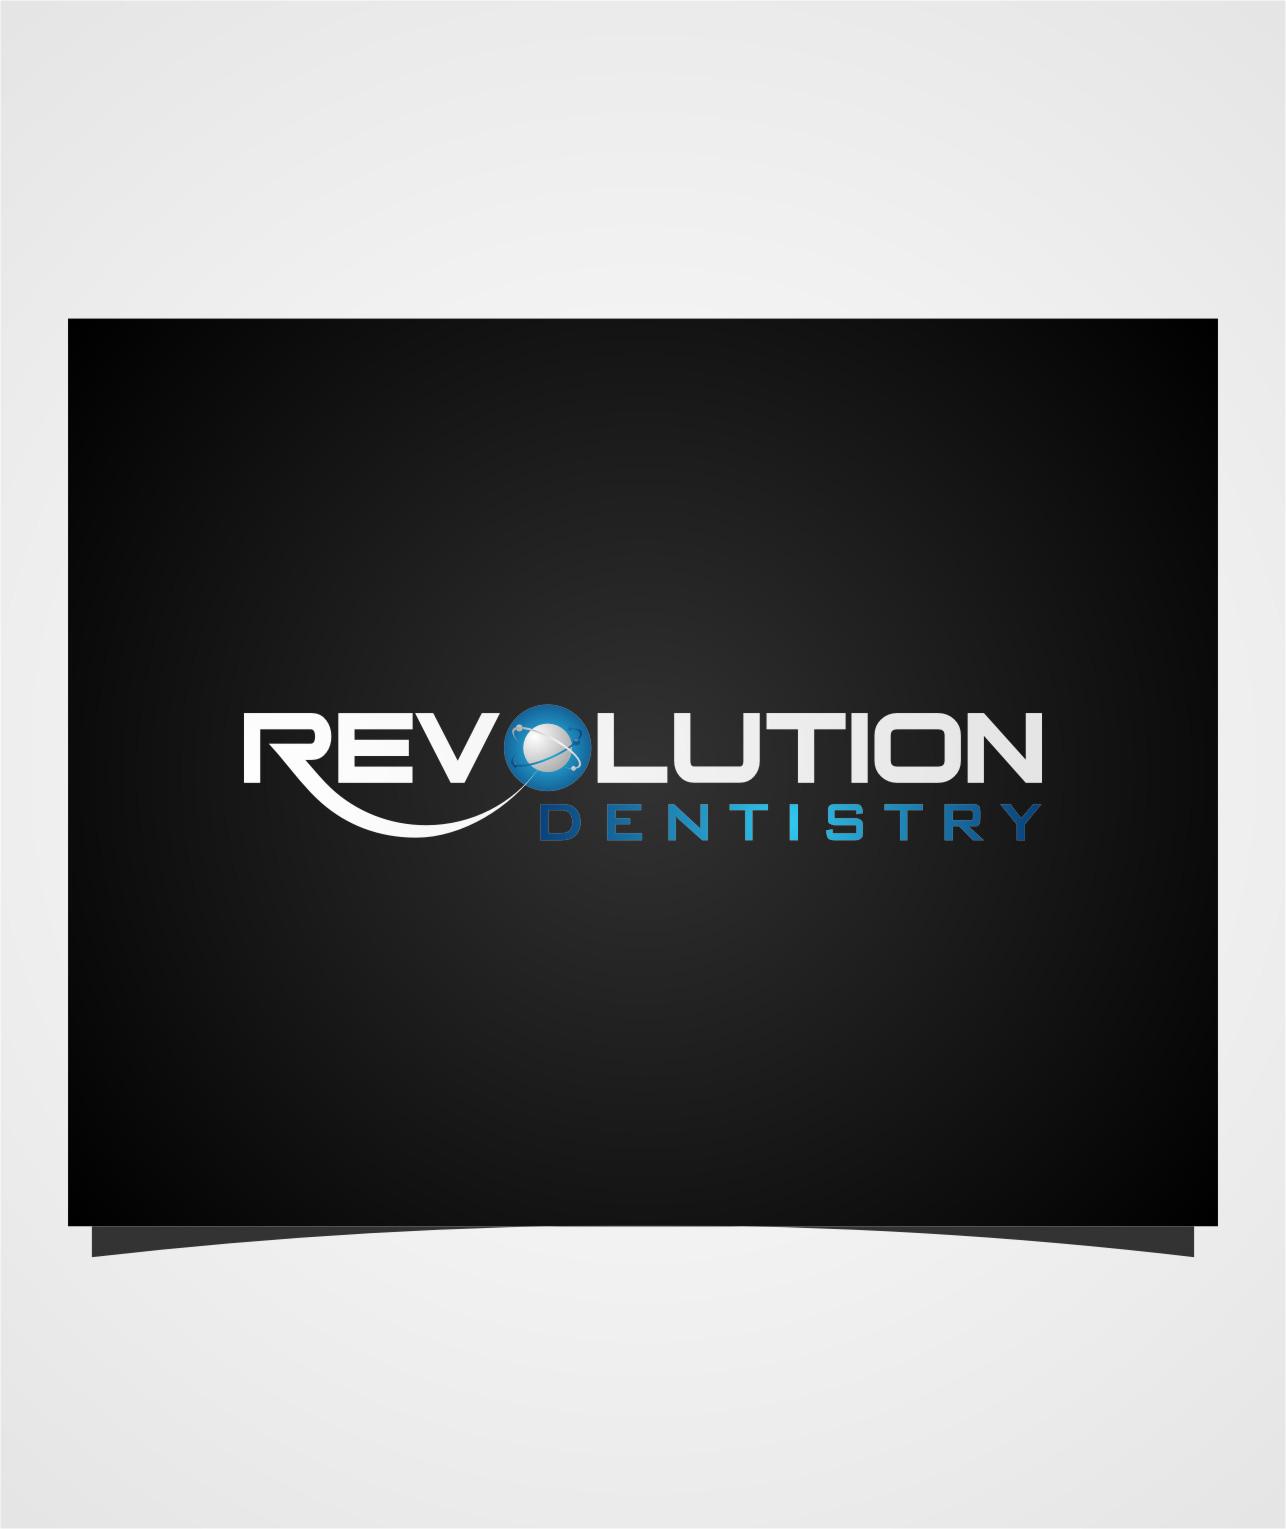 Logo Design by Ngepet_art - Entry No. 54 in the Logo Design Contest Artistic Logo Design for Revolution Dentistry.